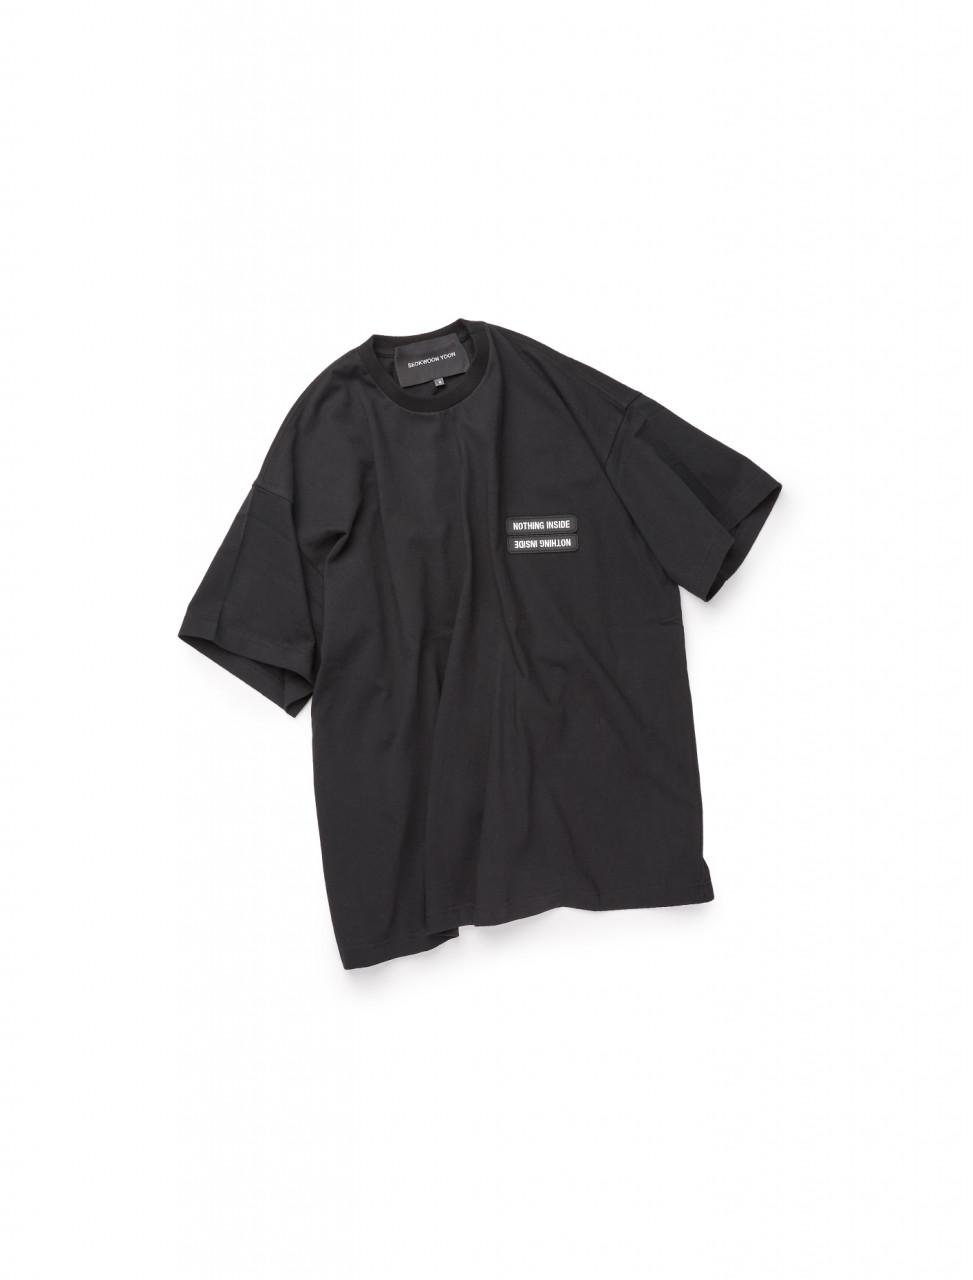 351-SWAW20-505 SEOKWOON YOON NOTHING INSIDE DOUBLE LOGO T SHIRT BLACK